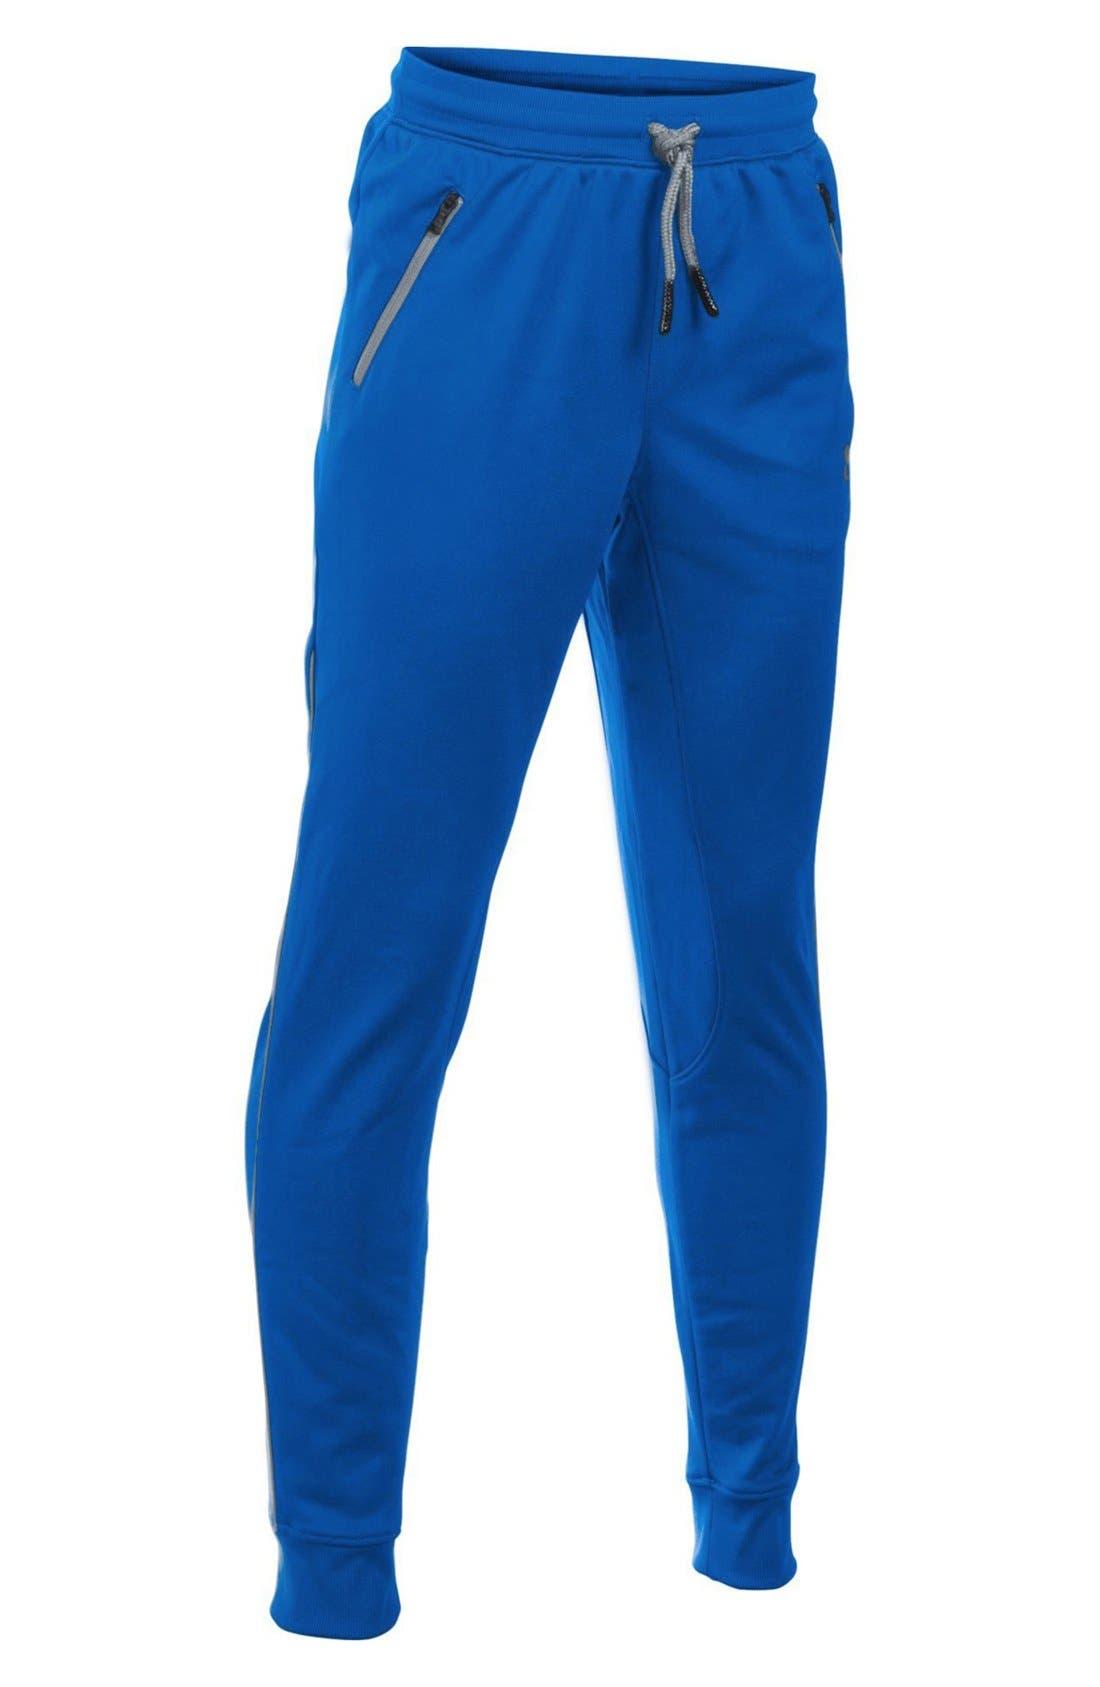 'Pennant' Tapered Pants,                             Main thumbnail 1, color,                             Ultra Blue/ Black